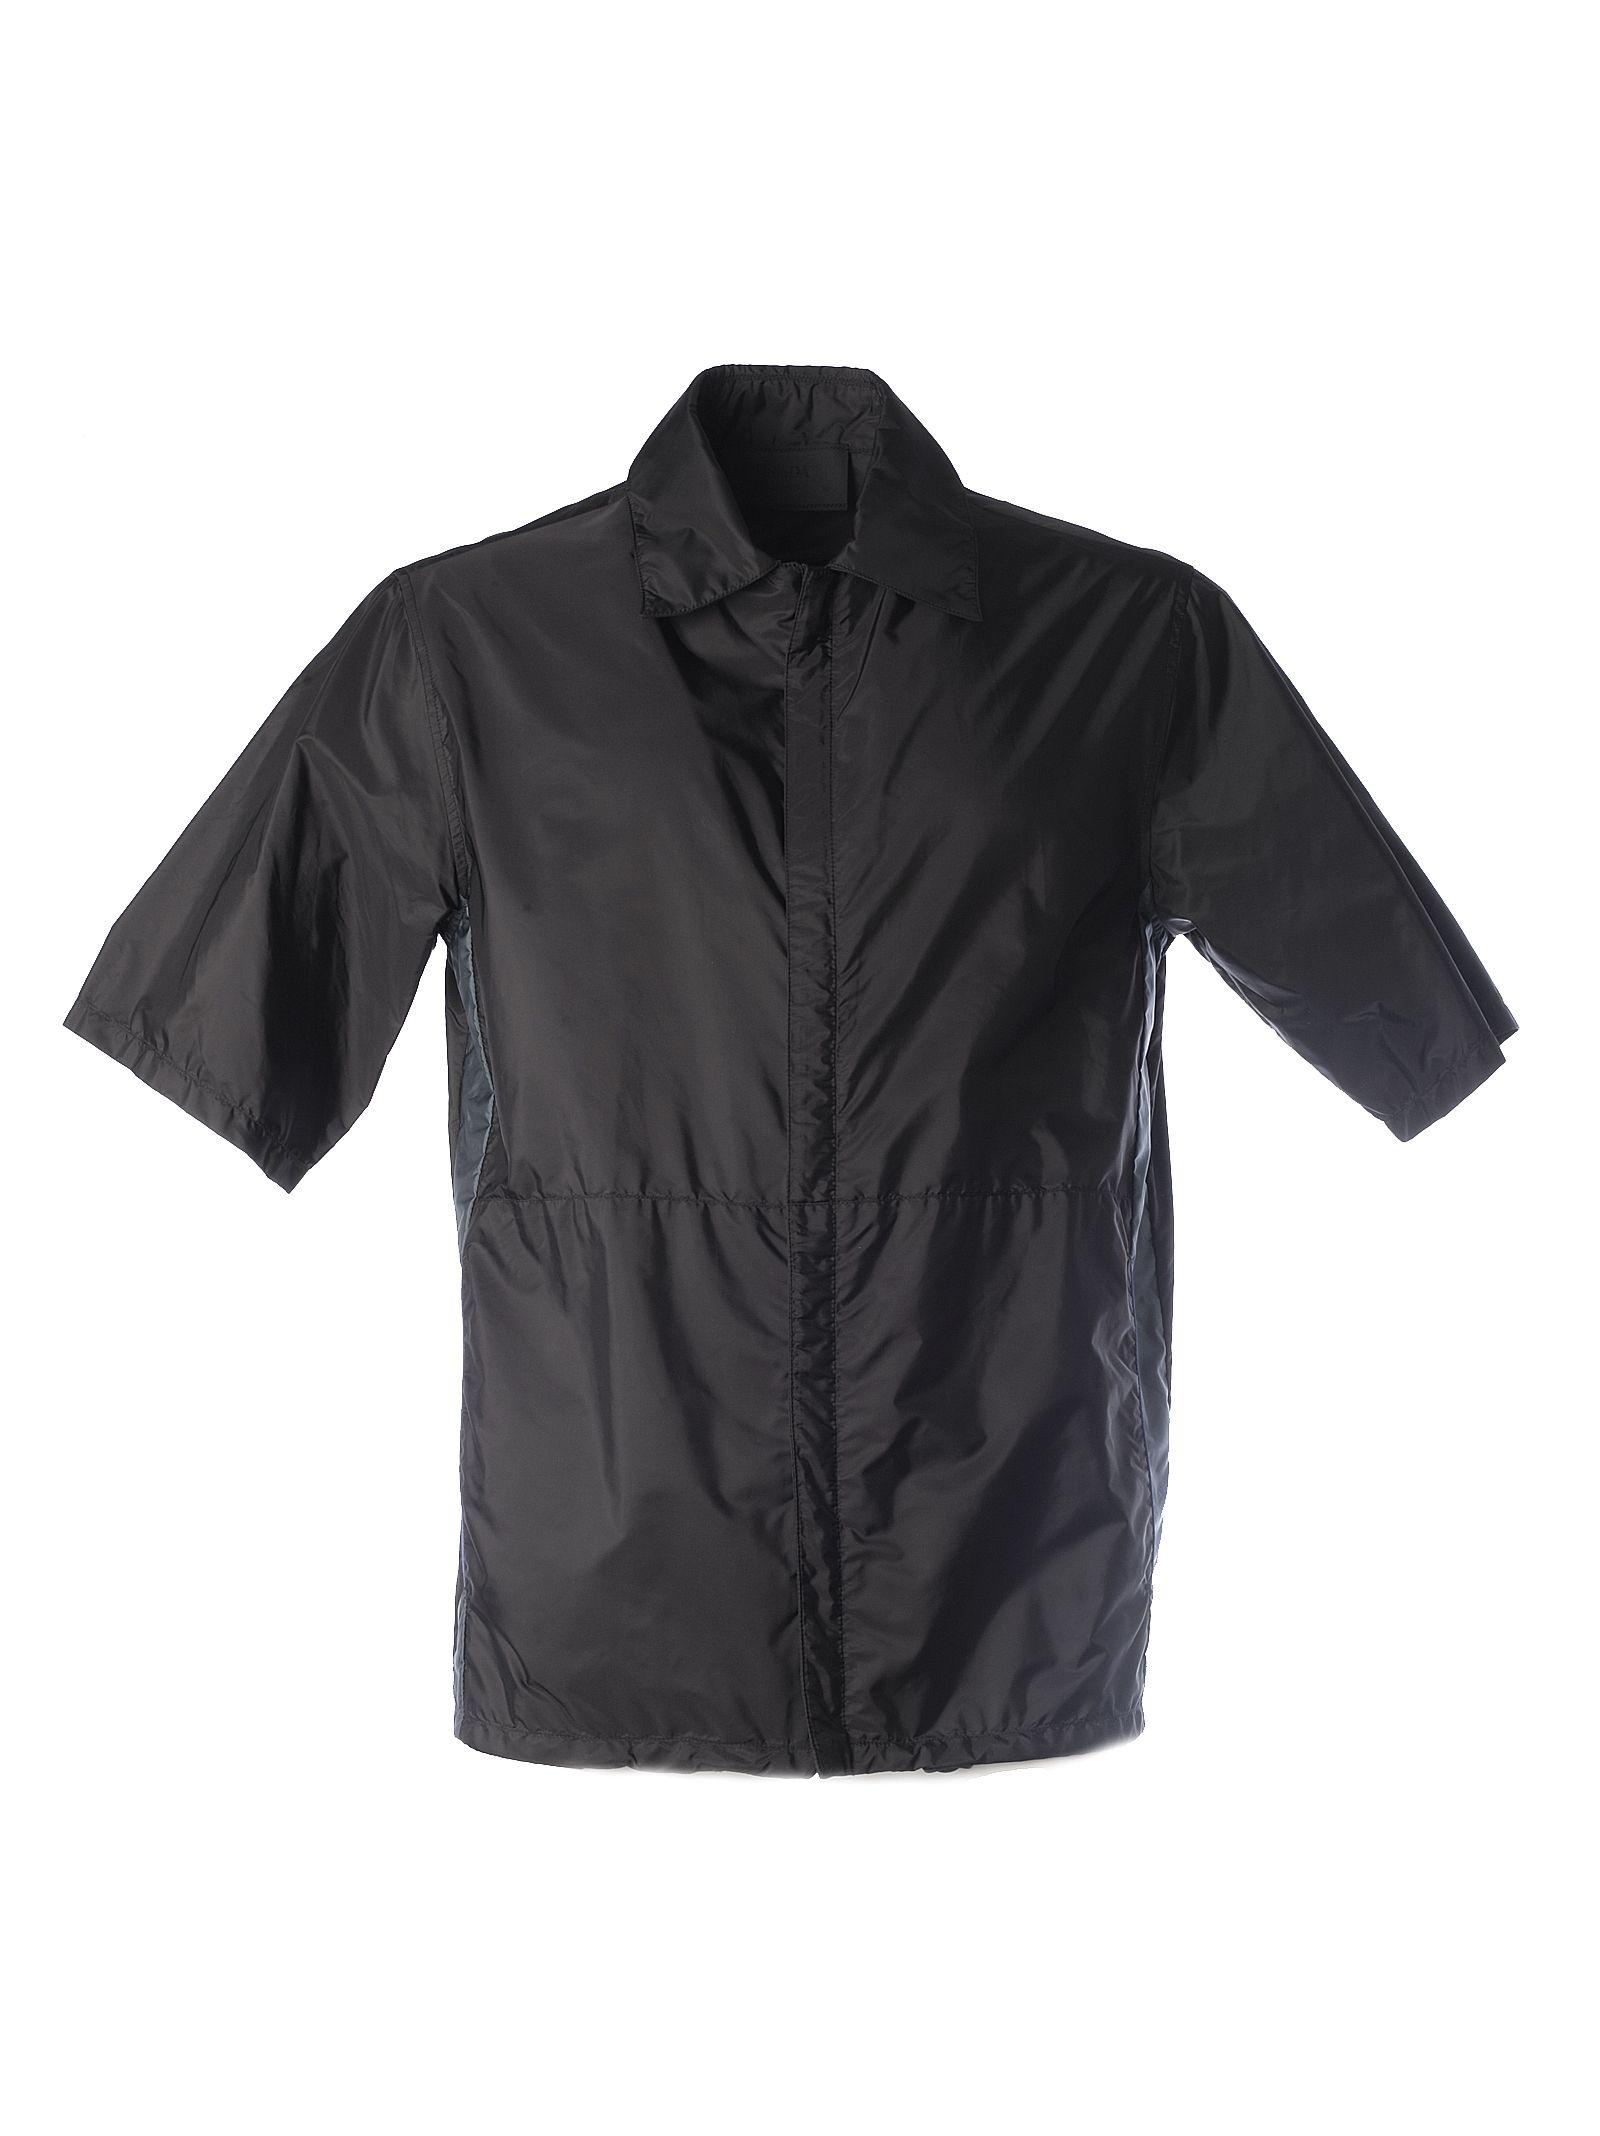 Prada Men's Polyamide Outerwear Jacket   Upp till 70